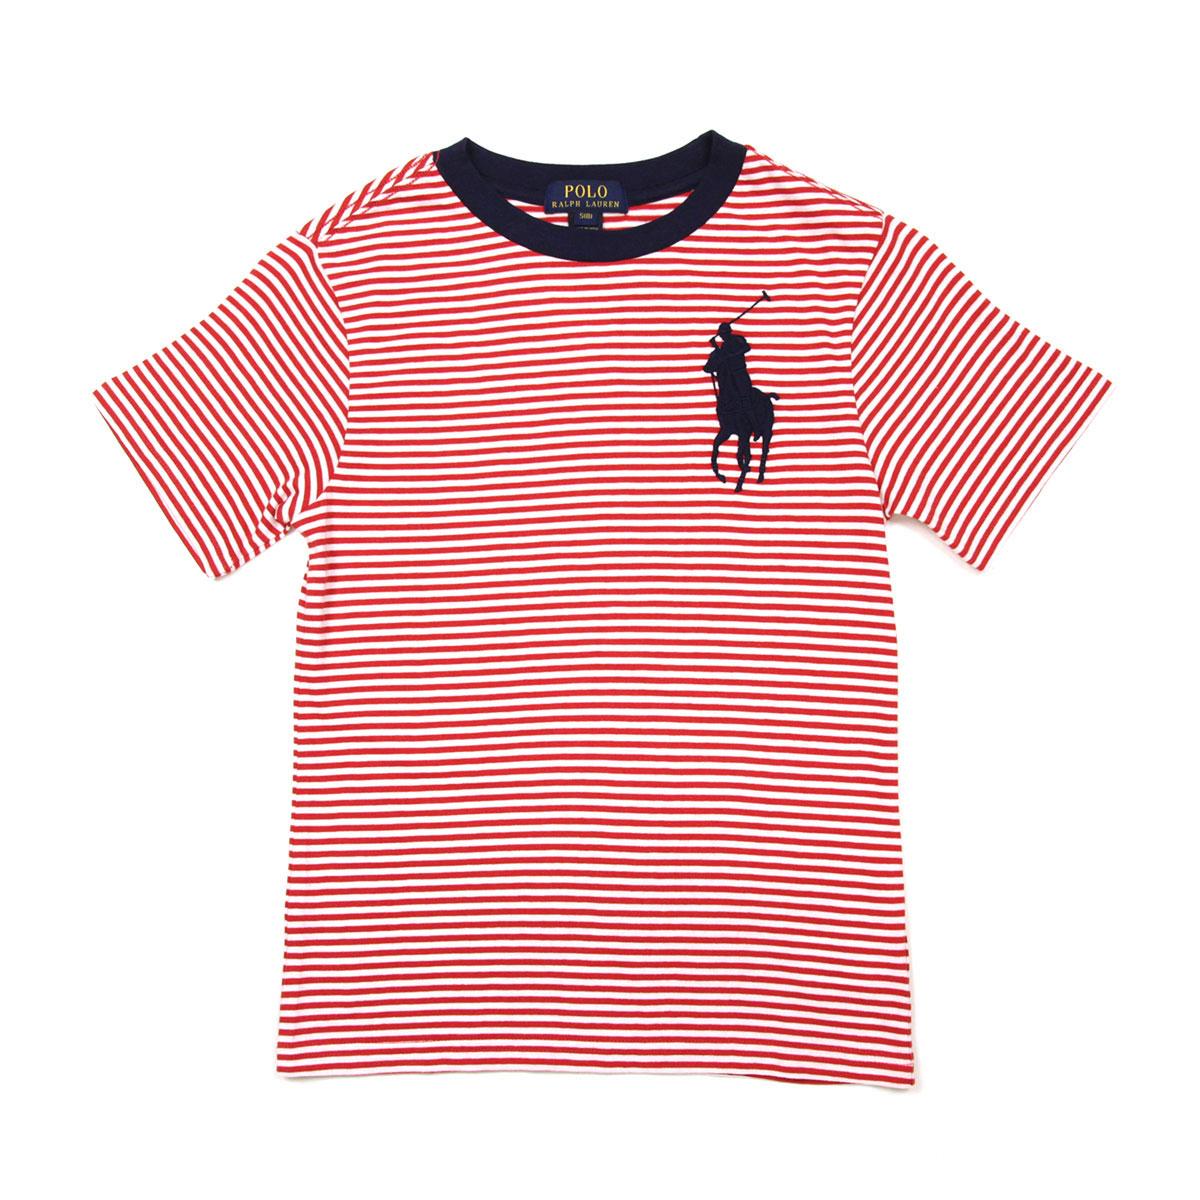 bdb0ceb2 Poloralflorenkids POLO RALPH LAUREN CHILDREN genuine kids clothing boys  short sleeve T shirt COTTON BIG PONY S/S BORDER CREW TEE 323591327001  20P05Nov16